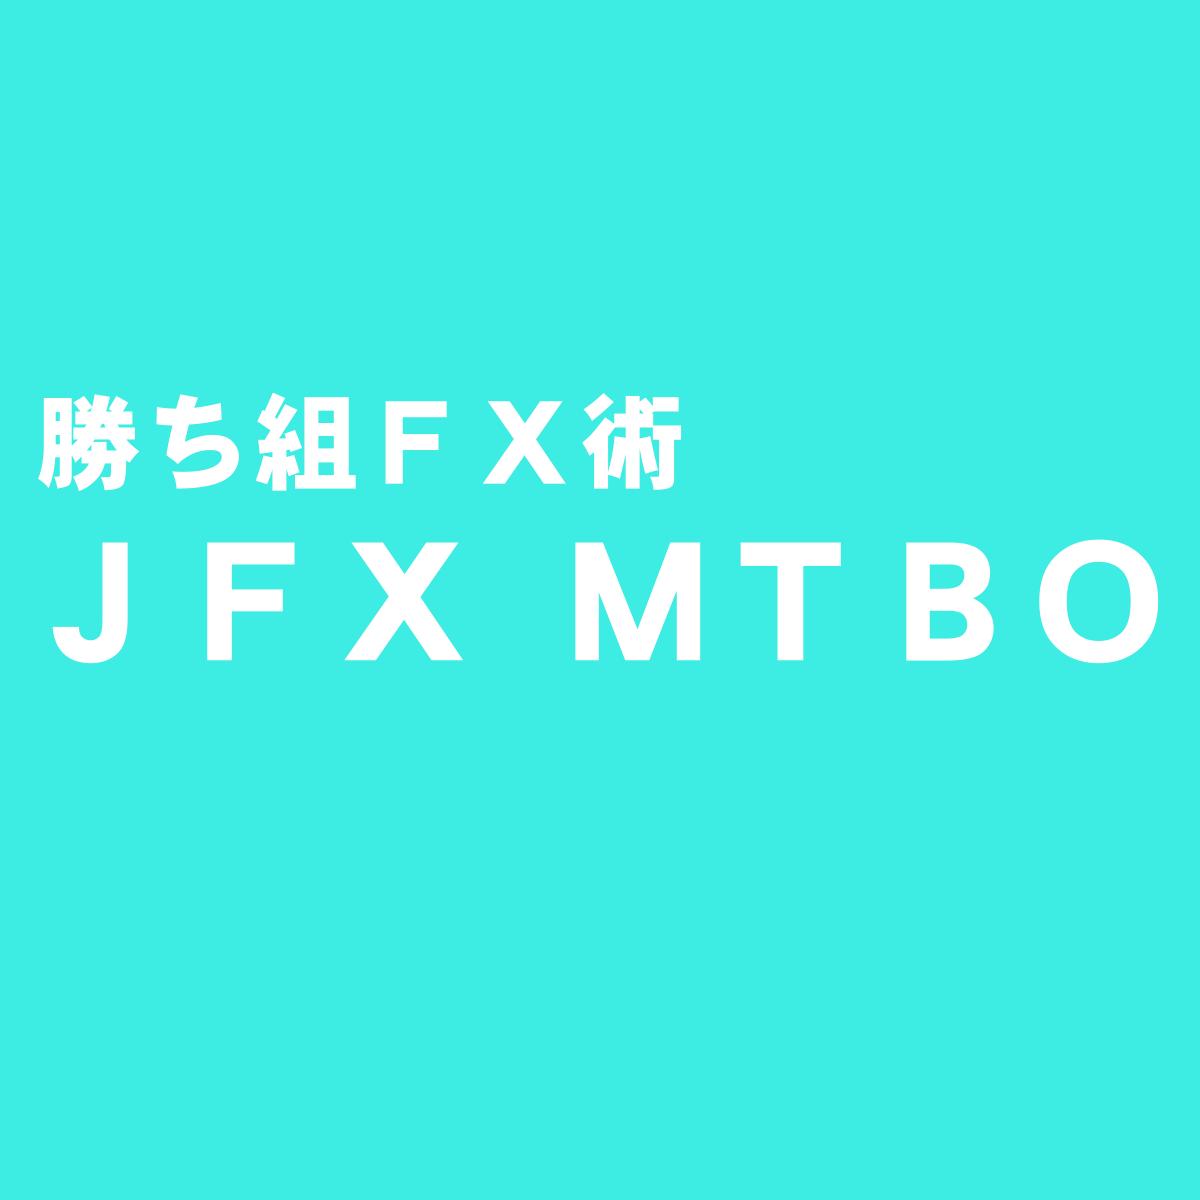 JFX MTBO